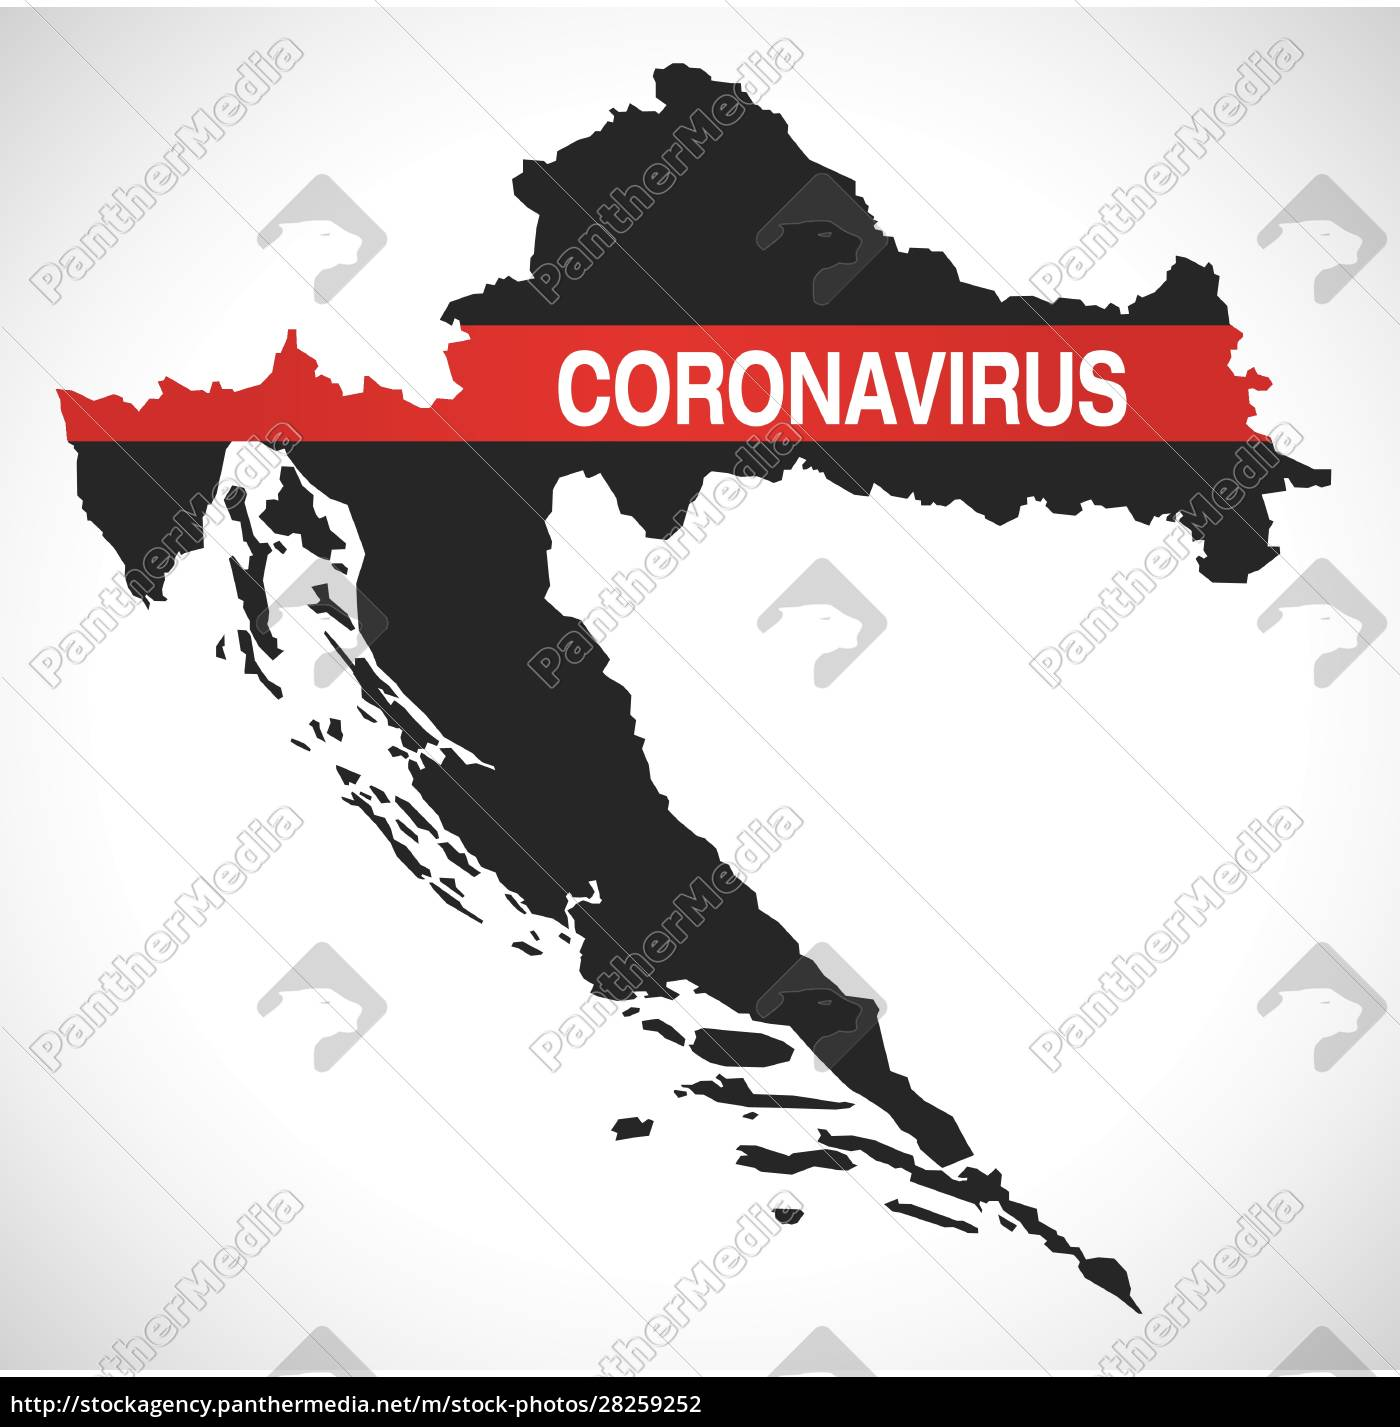 croatia, map, with, coronavirus, warning, illustration - 28259252